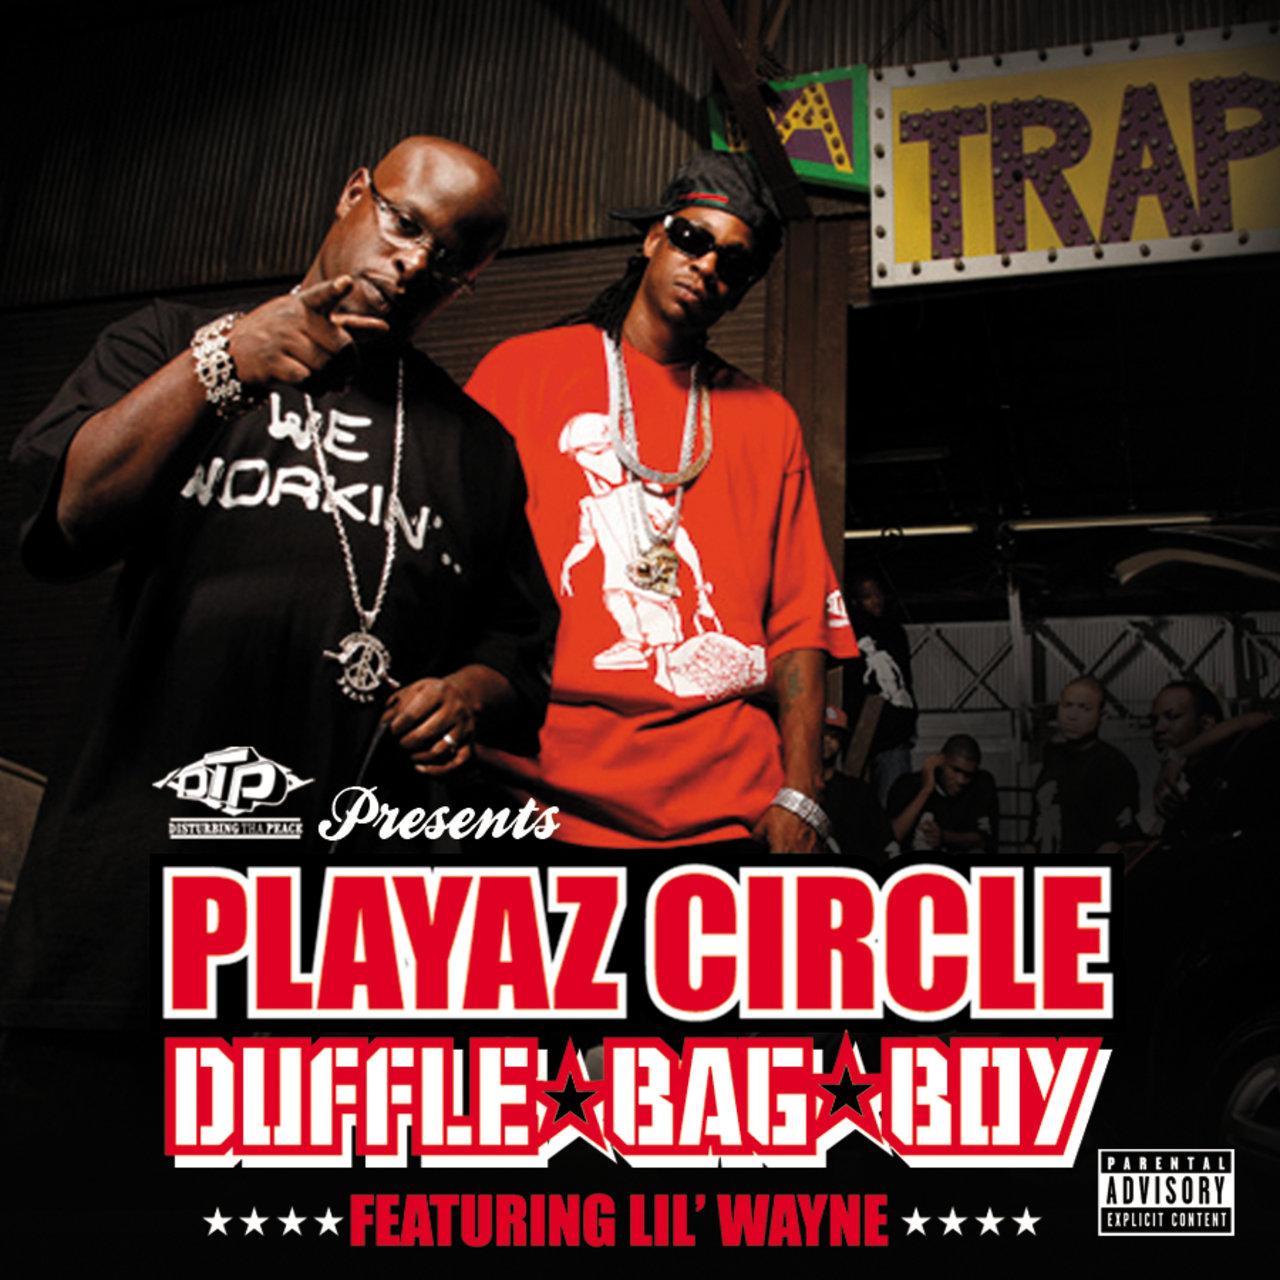 Tidal listen to playaz circle on tidal jpg 1280x1280 Playaz circle 7996da4a36a55